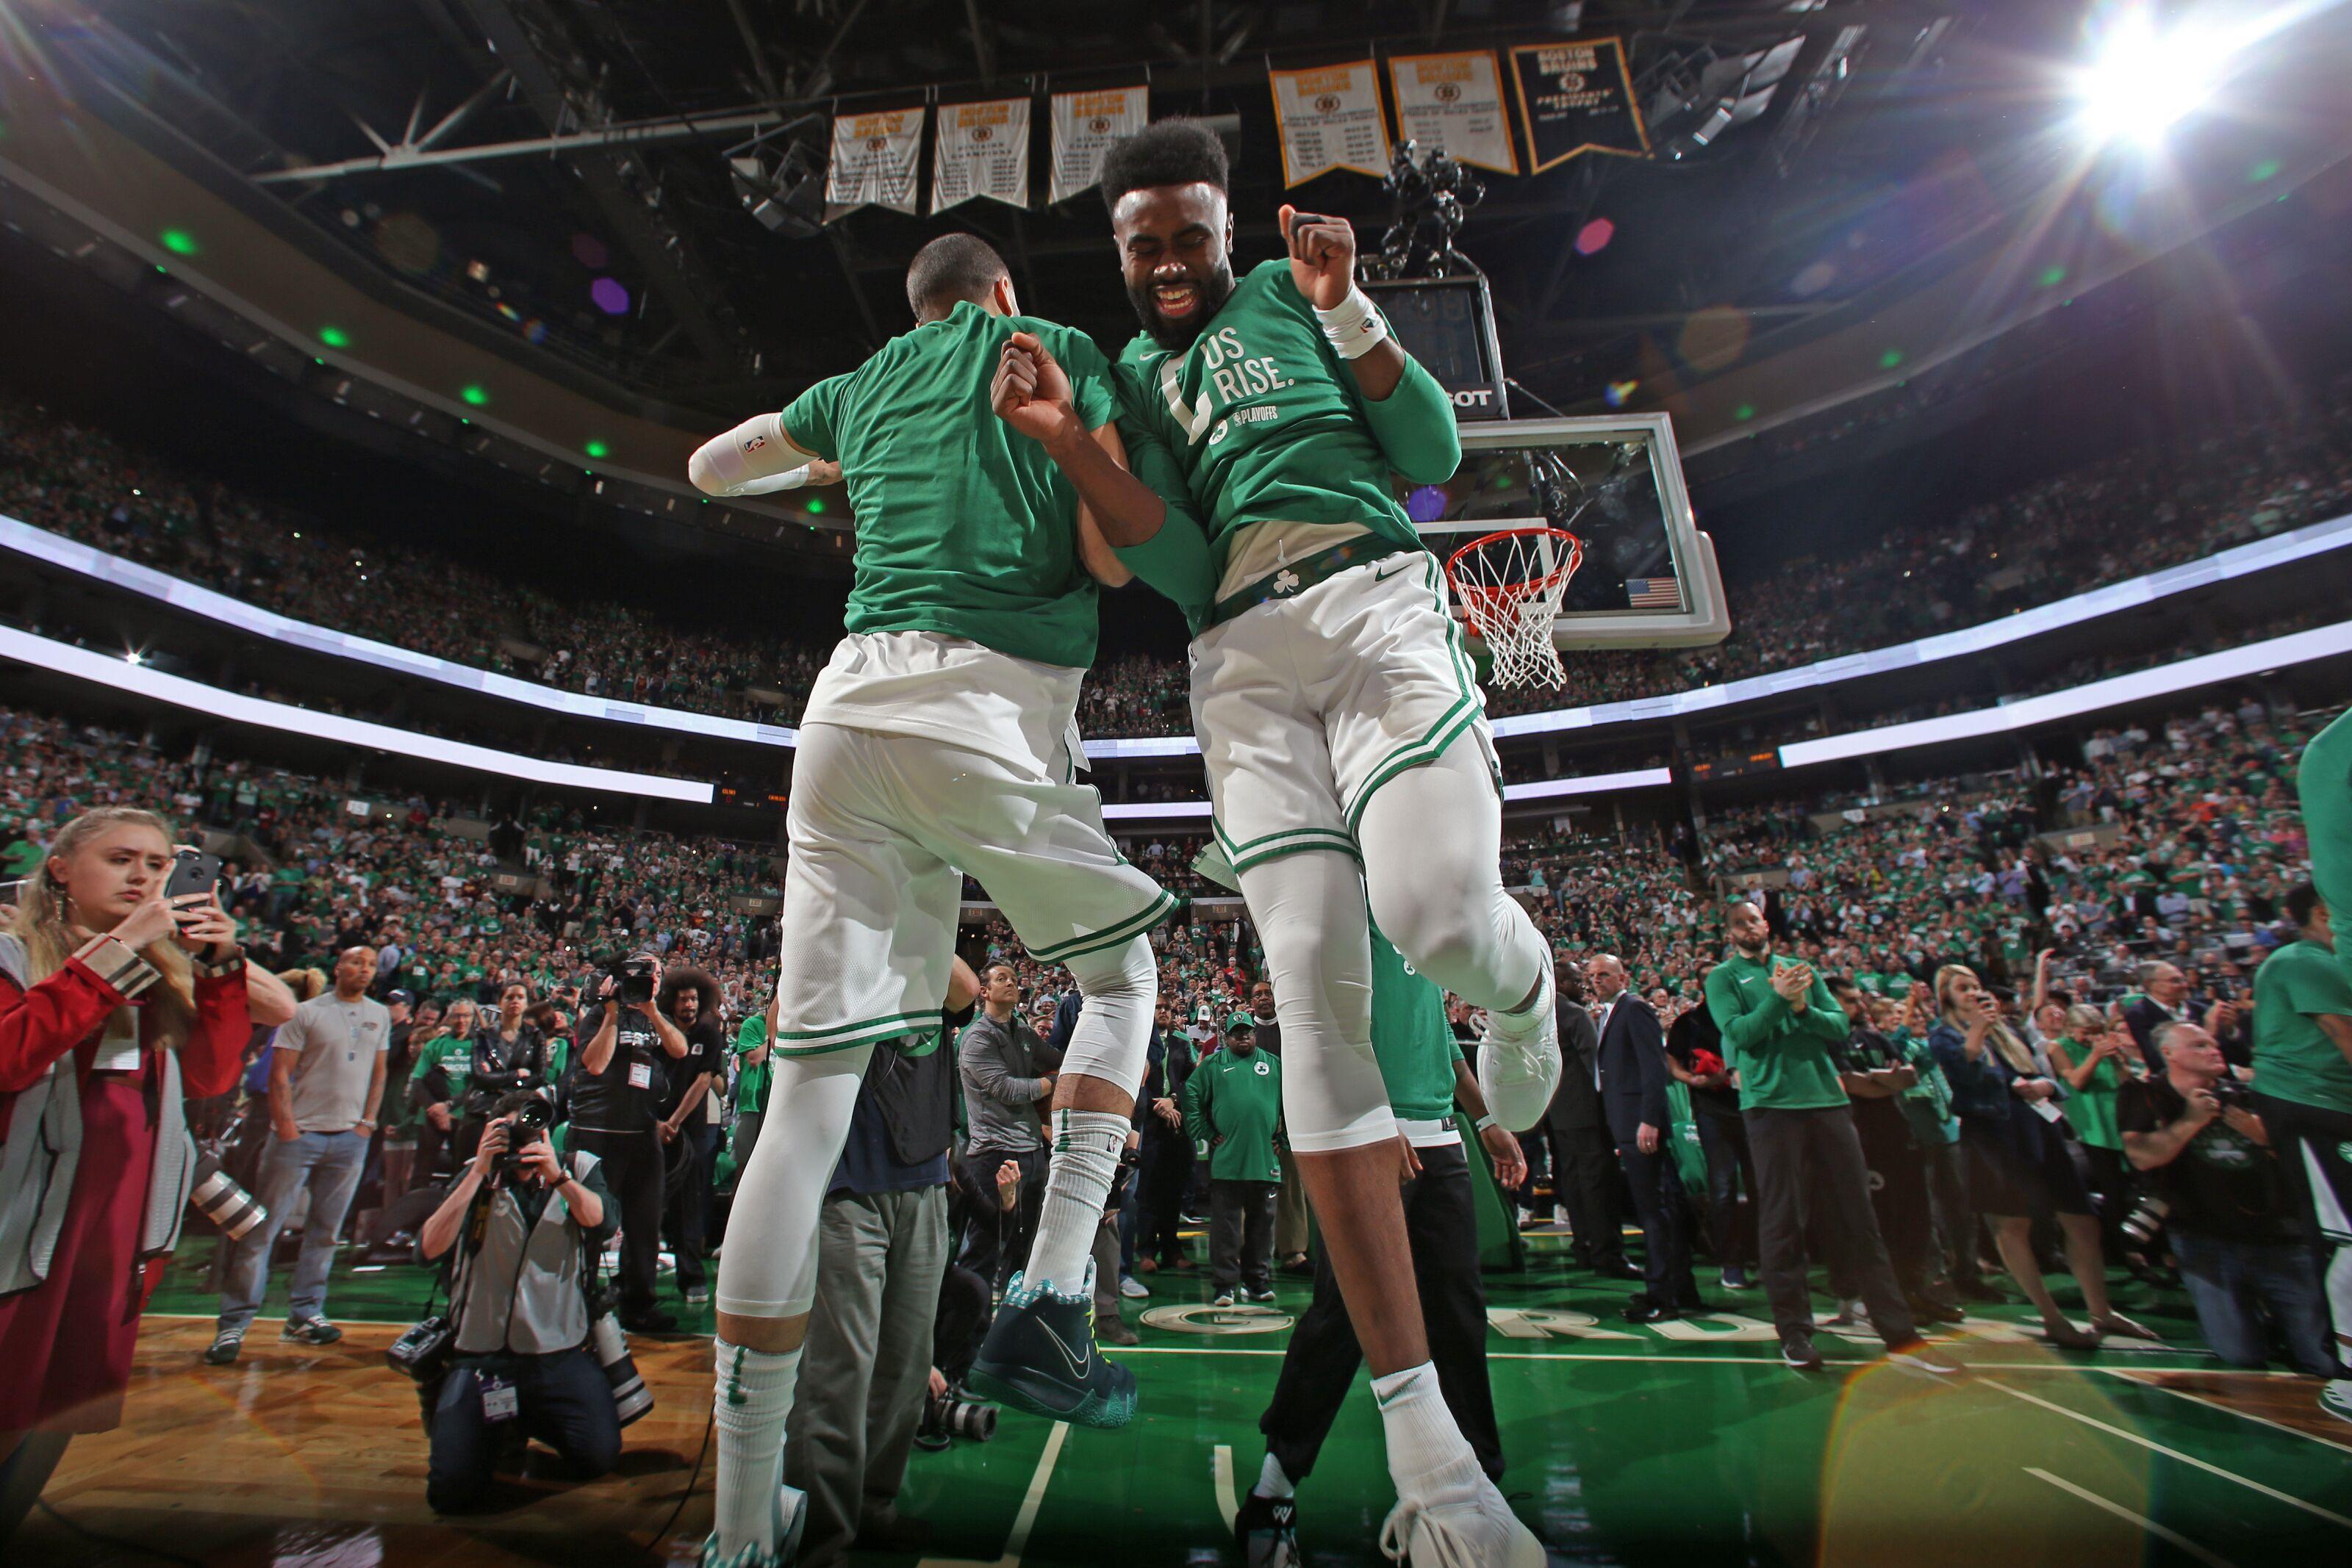 b1105ff873c1 Boston Celtics  3 takeaways from Game 5 vs. Cavaliers